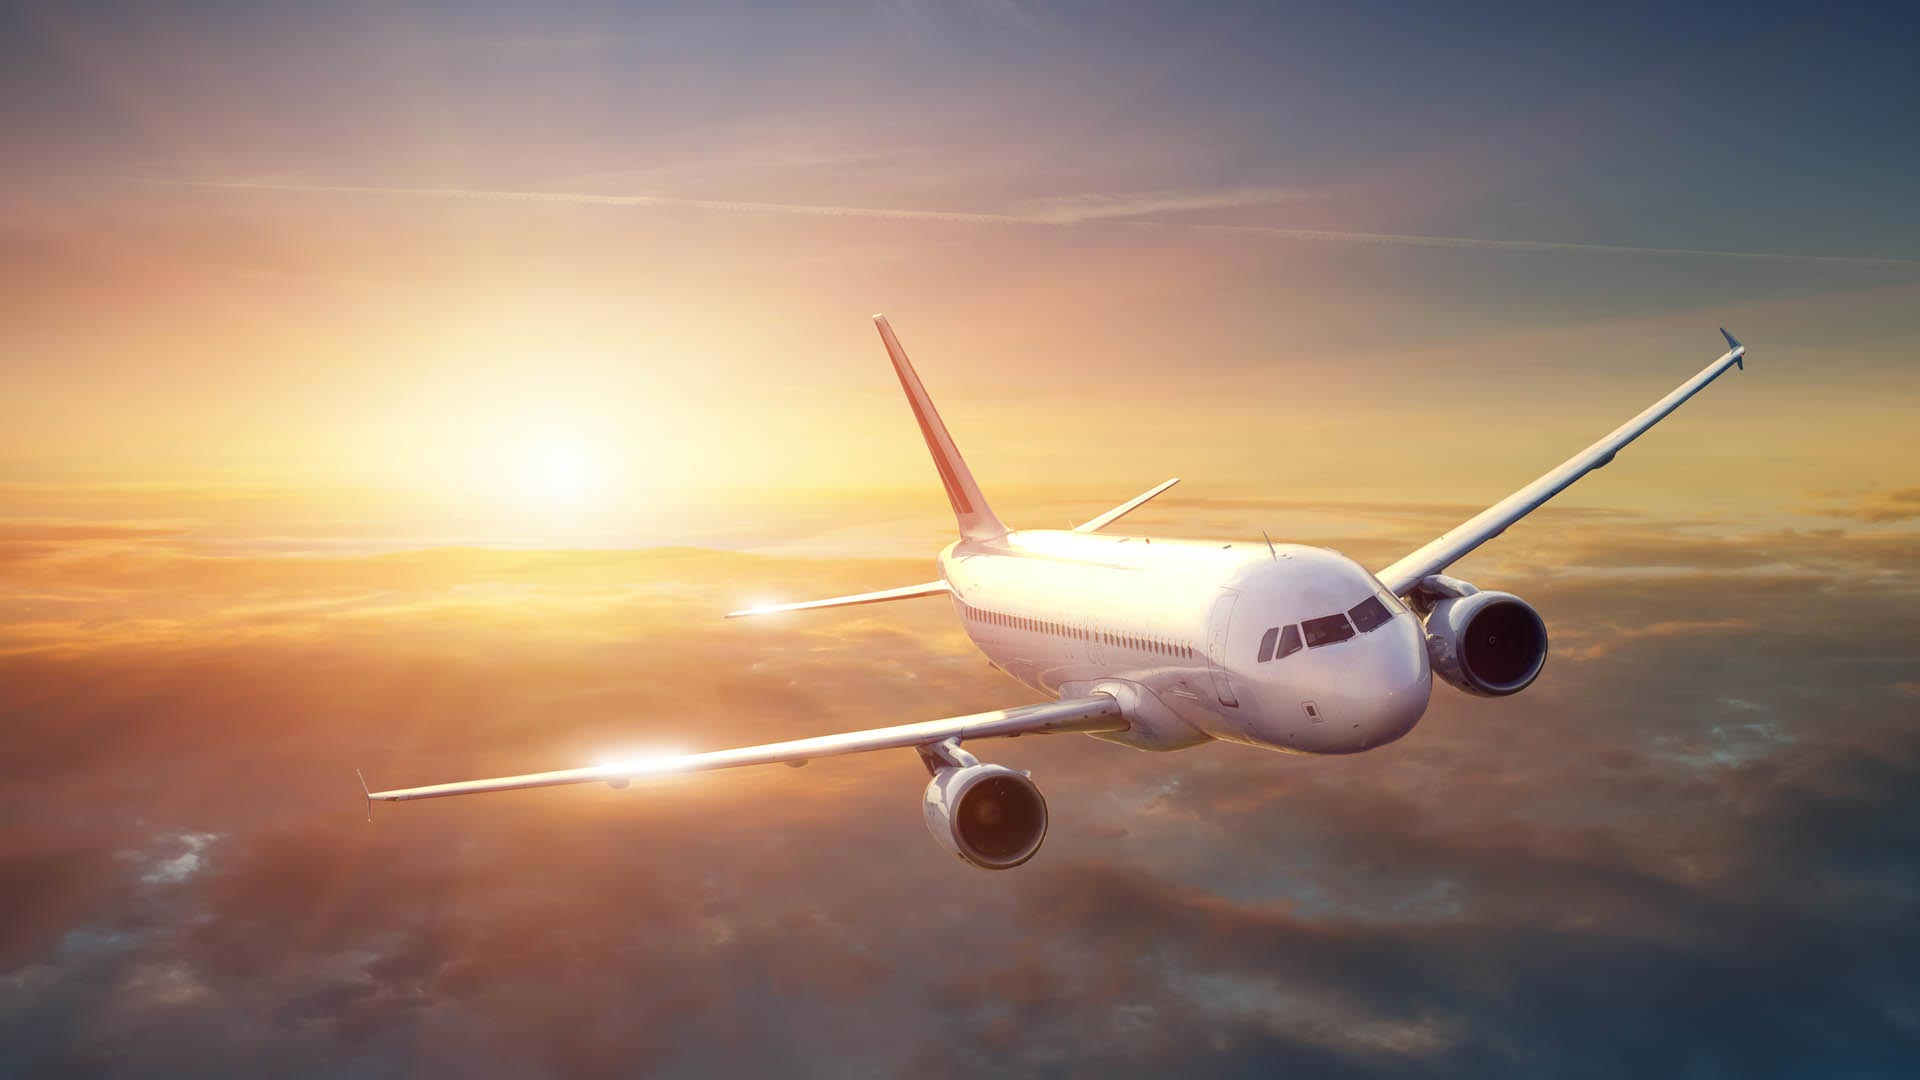 IFTC – International Flight Training Center